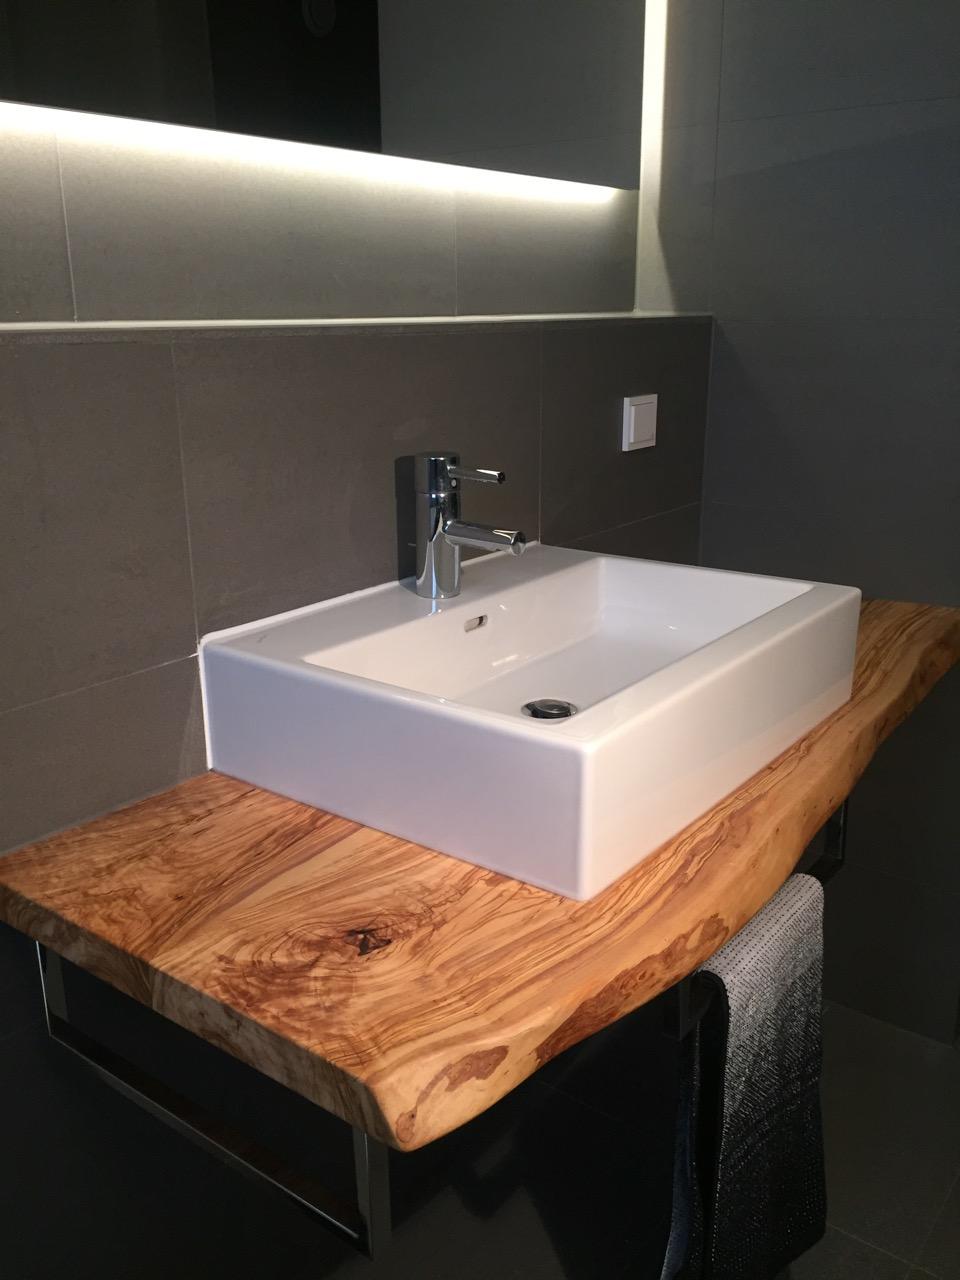 waschtisch mit olivenholz gr becken. Black Bedroom Furniture Sets. Home Design Ideas